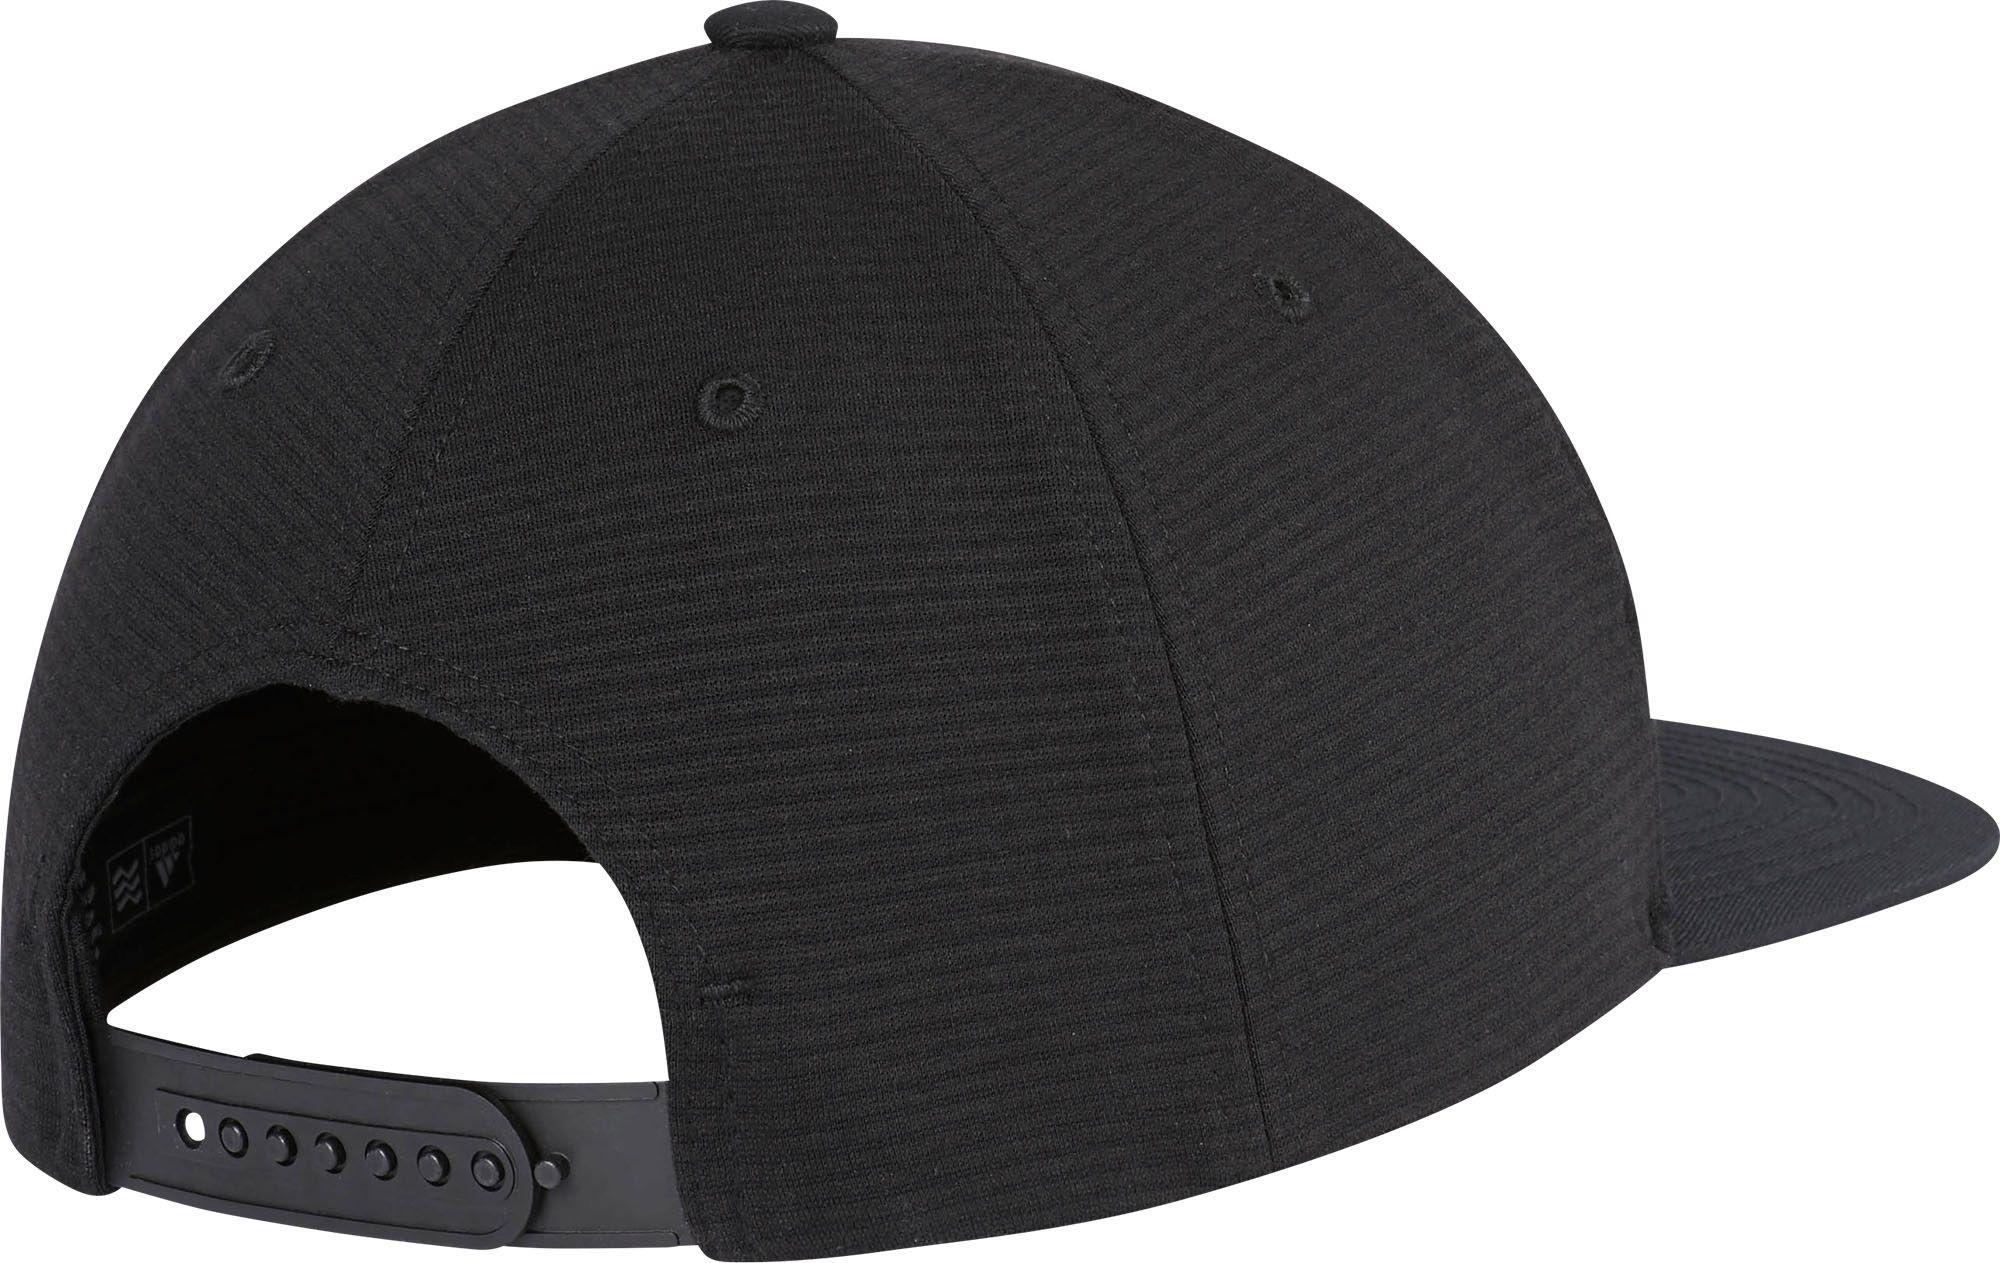 ab703c53 Adidas - Black Adicross Flatbill Golf Hat for Men - Lyst. View fullscreen